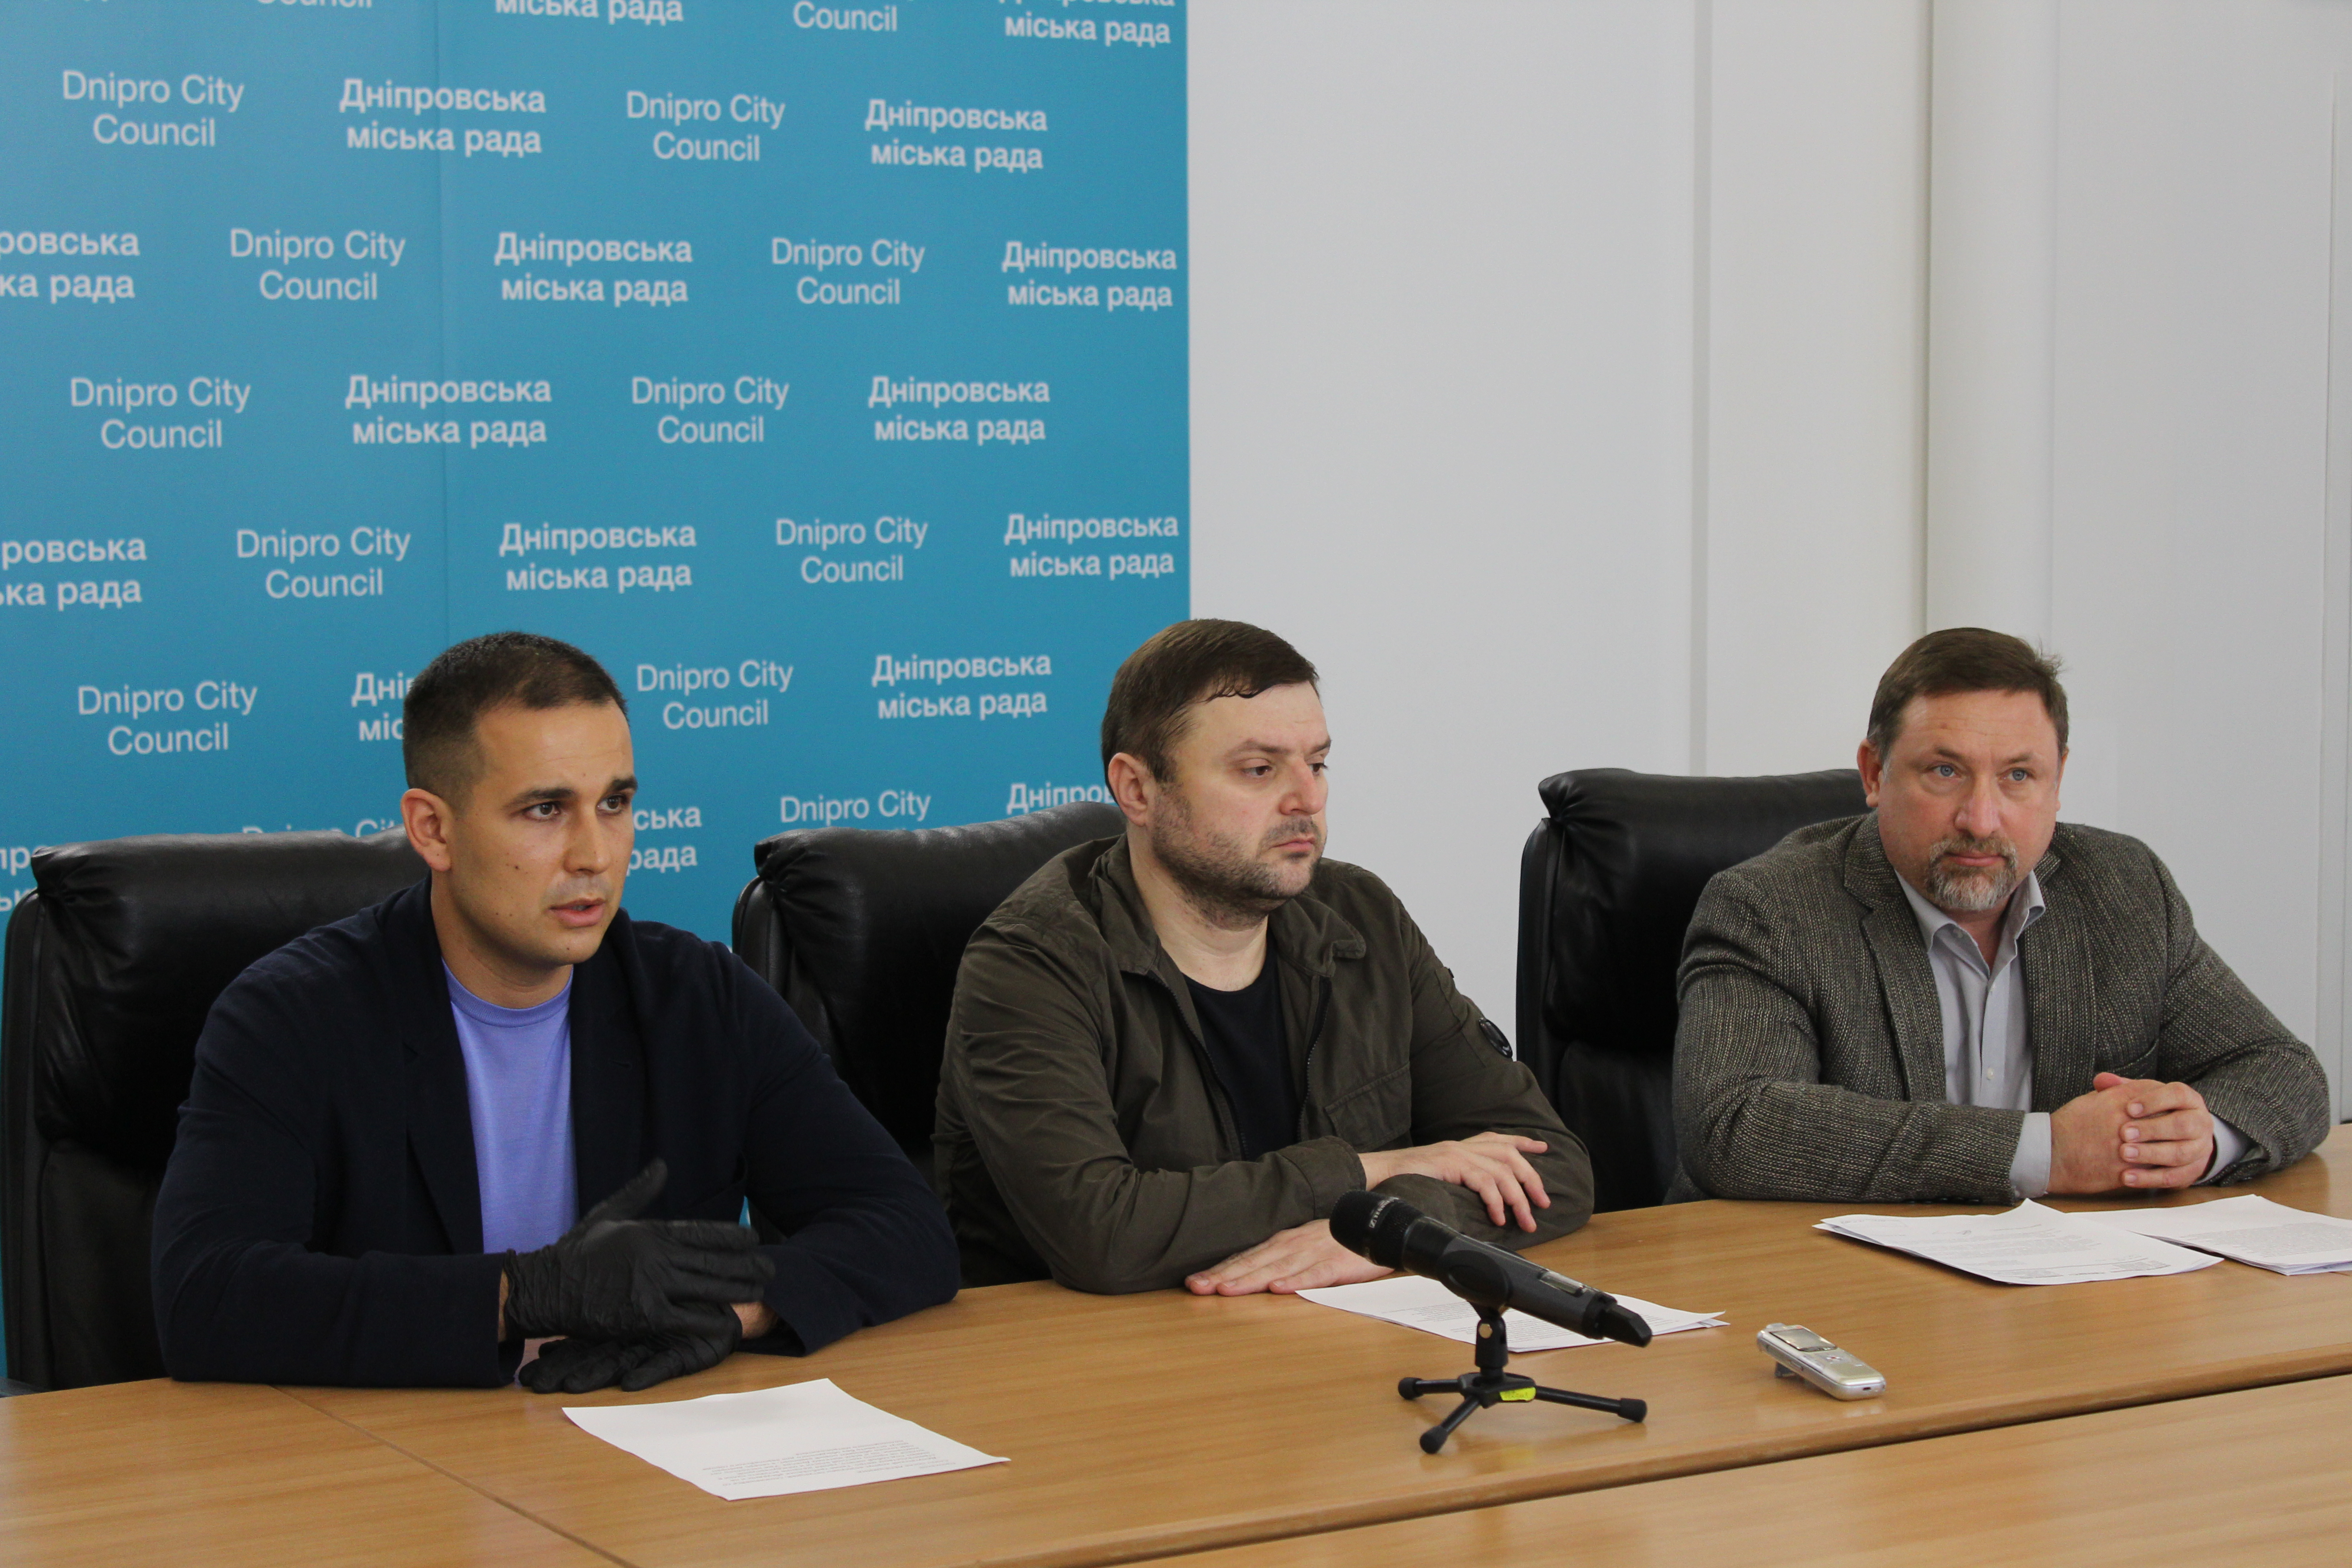 В горсовете Днепра заявили, что строительству метрополитена мешают. Новости Днепра